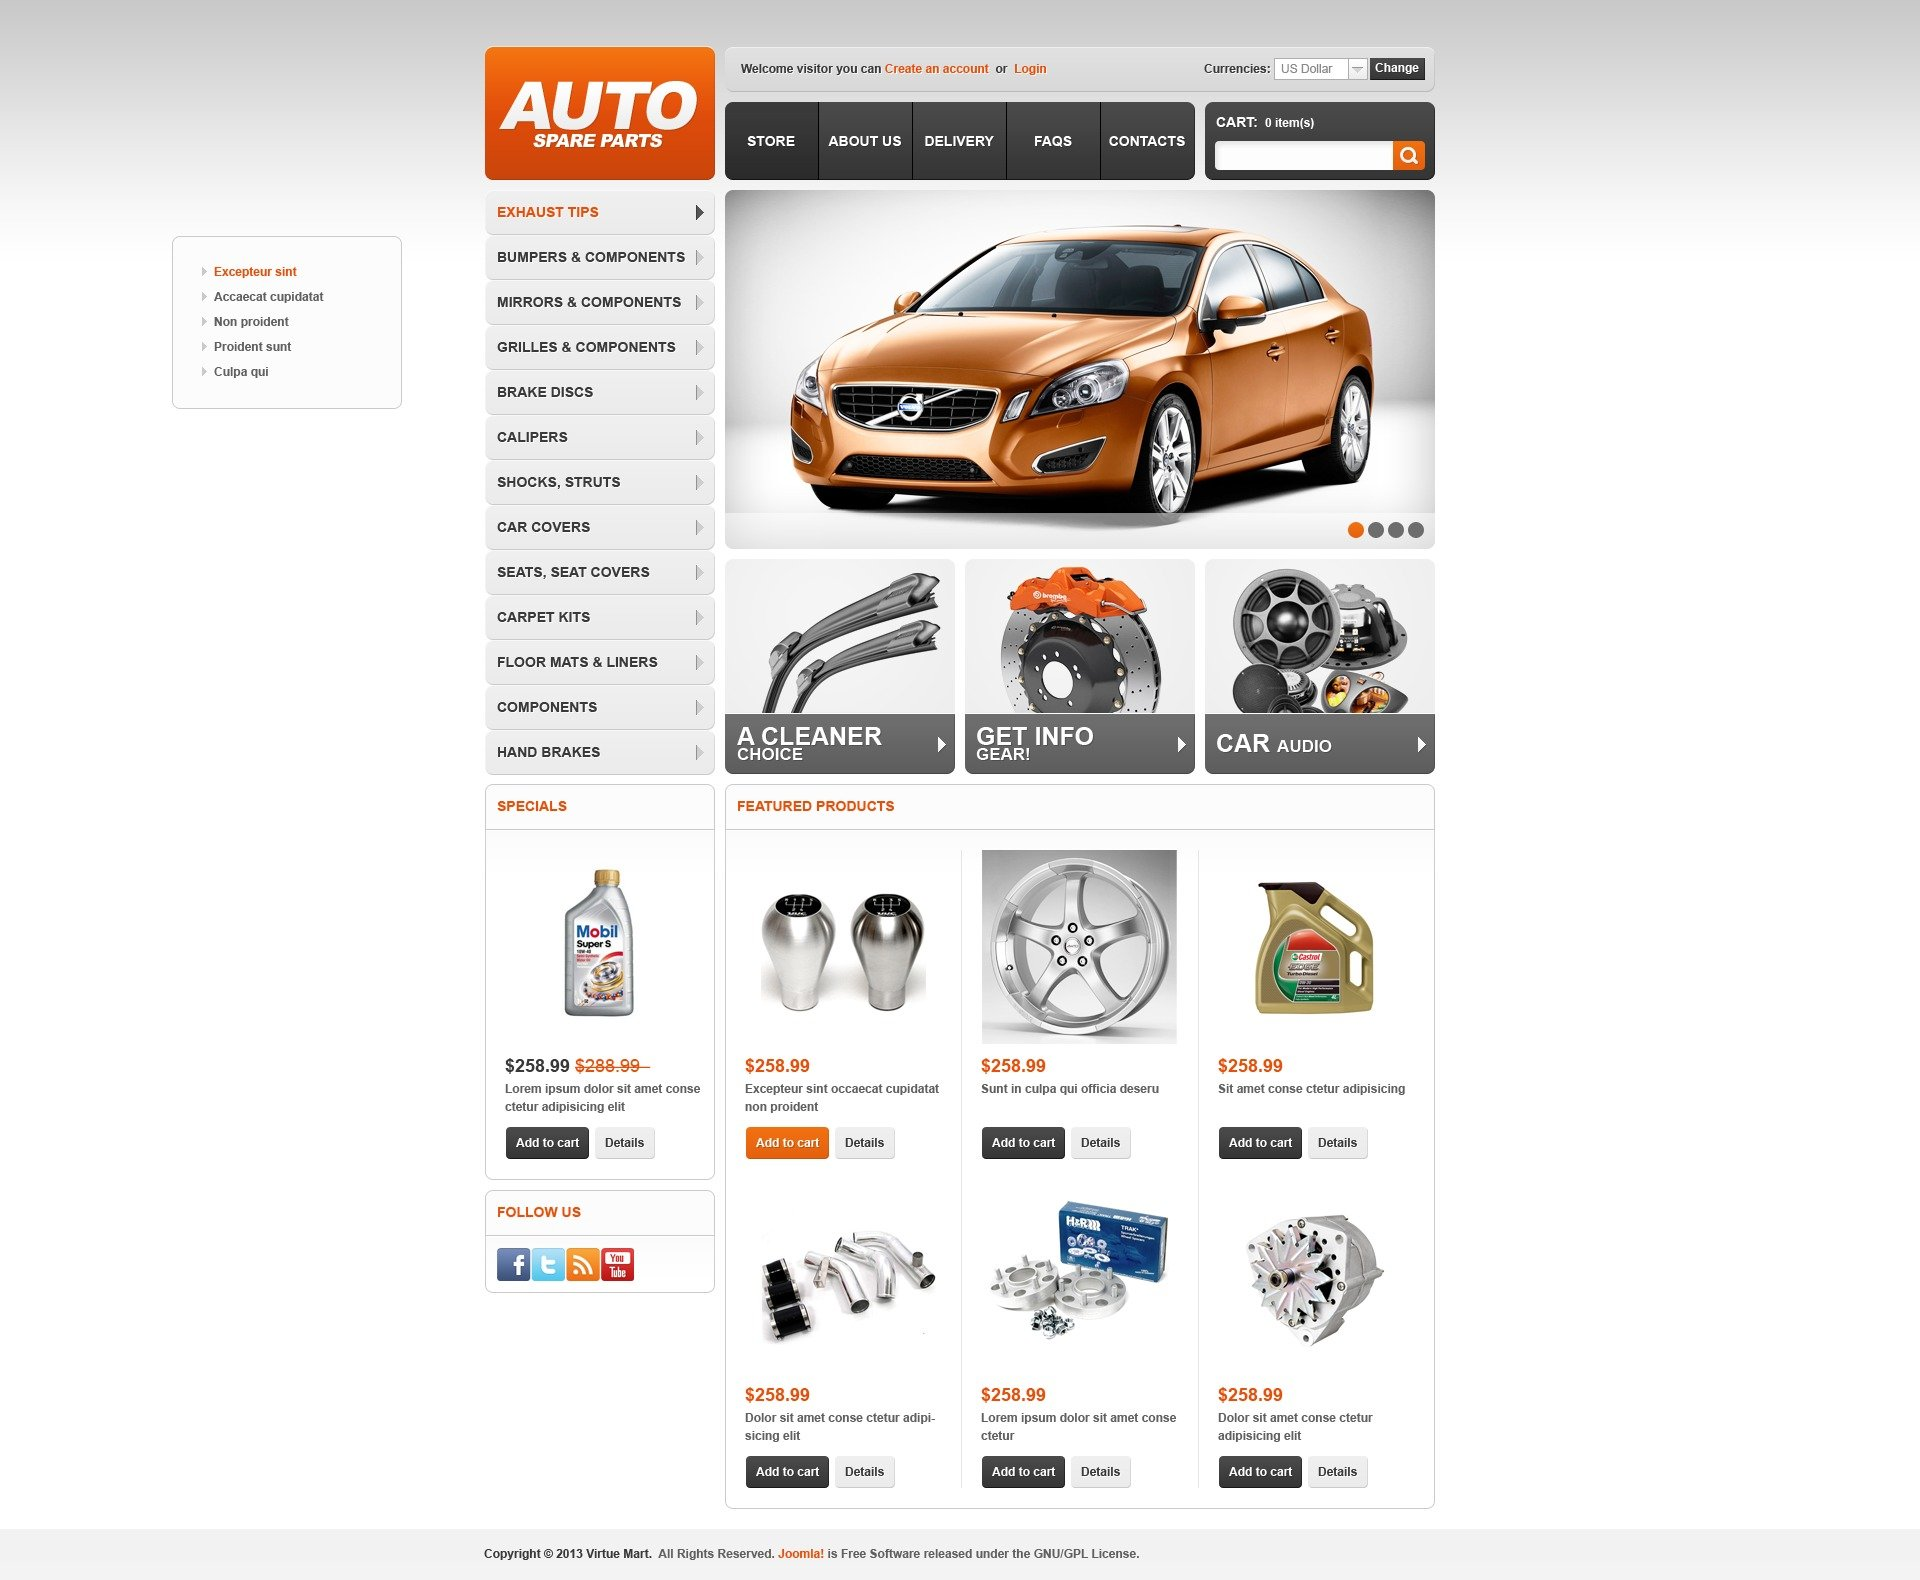 Auto Spare Parts VirtueMart sablon 44585